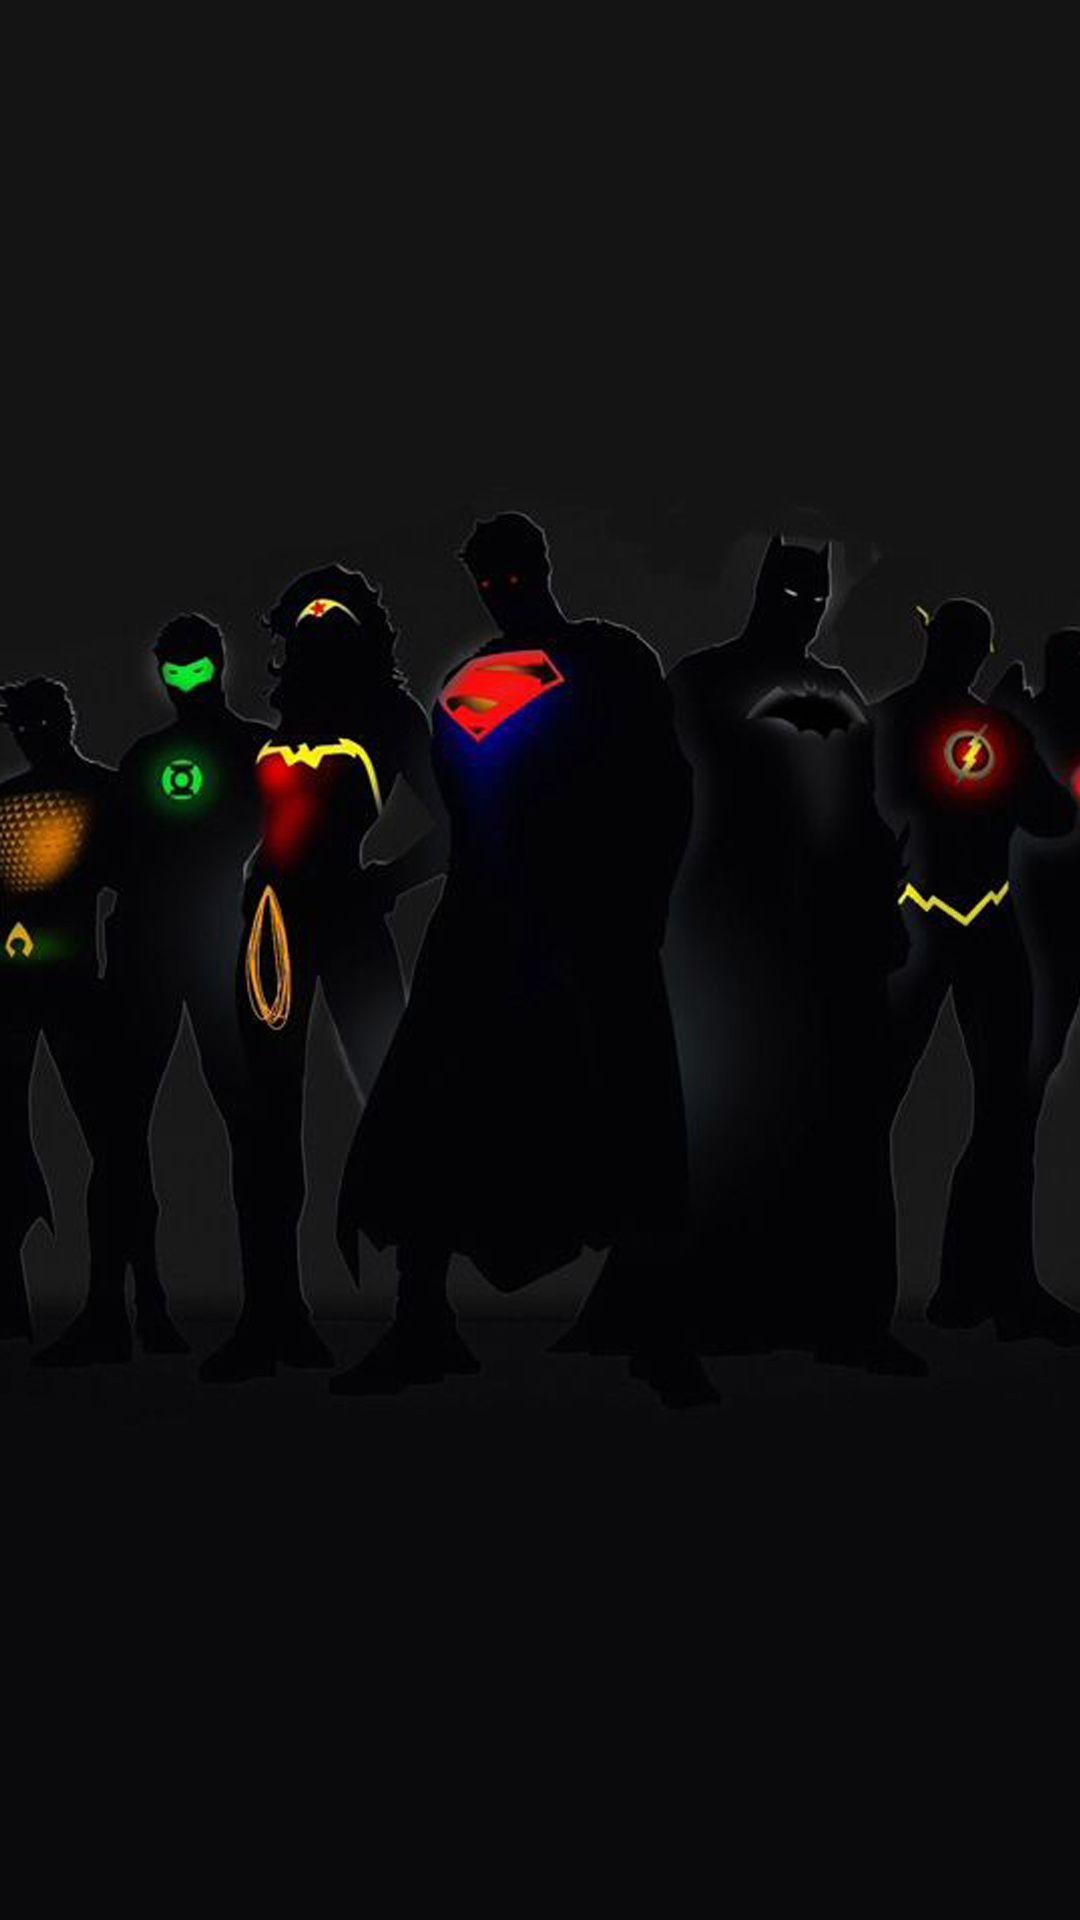 Justice League Wallpaper Iphone 6 Superhero Wallpaper Dc Comics Wallpaper Justice League